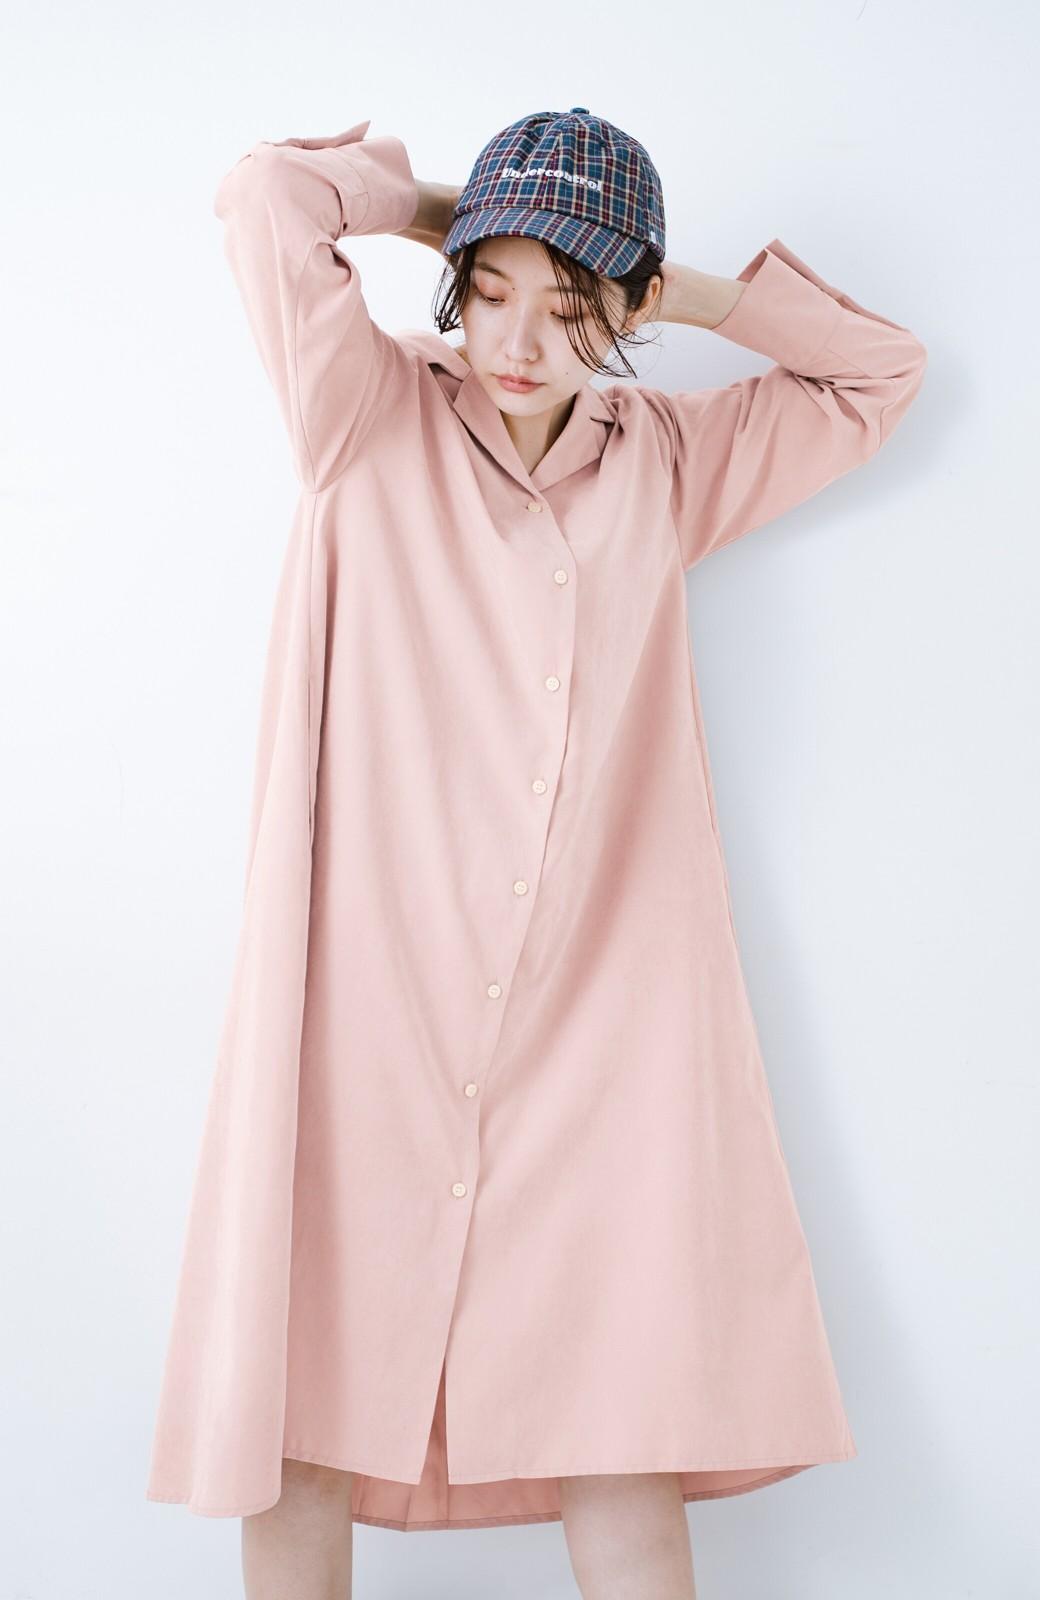 haco! 太ってもばれずに羽織っても便利なAラインワンピース <ピンク>の商品写真17